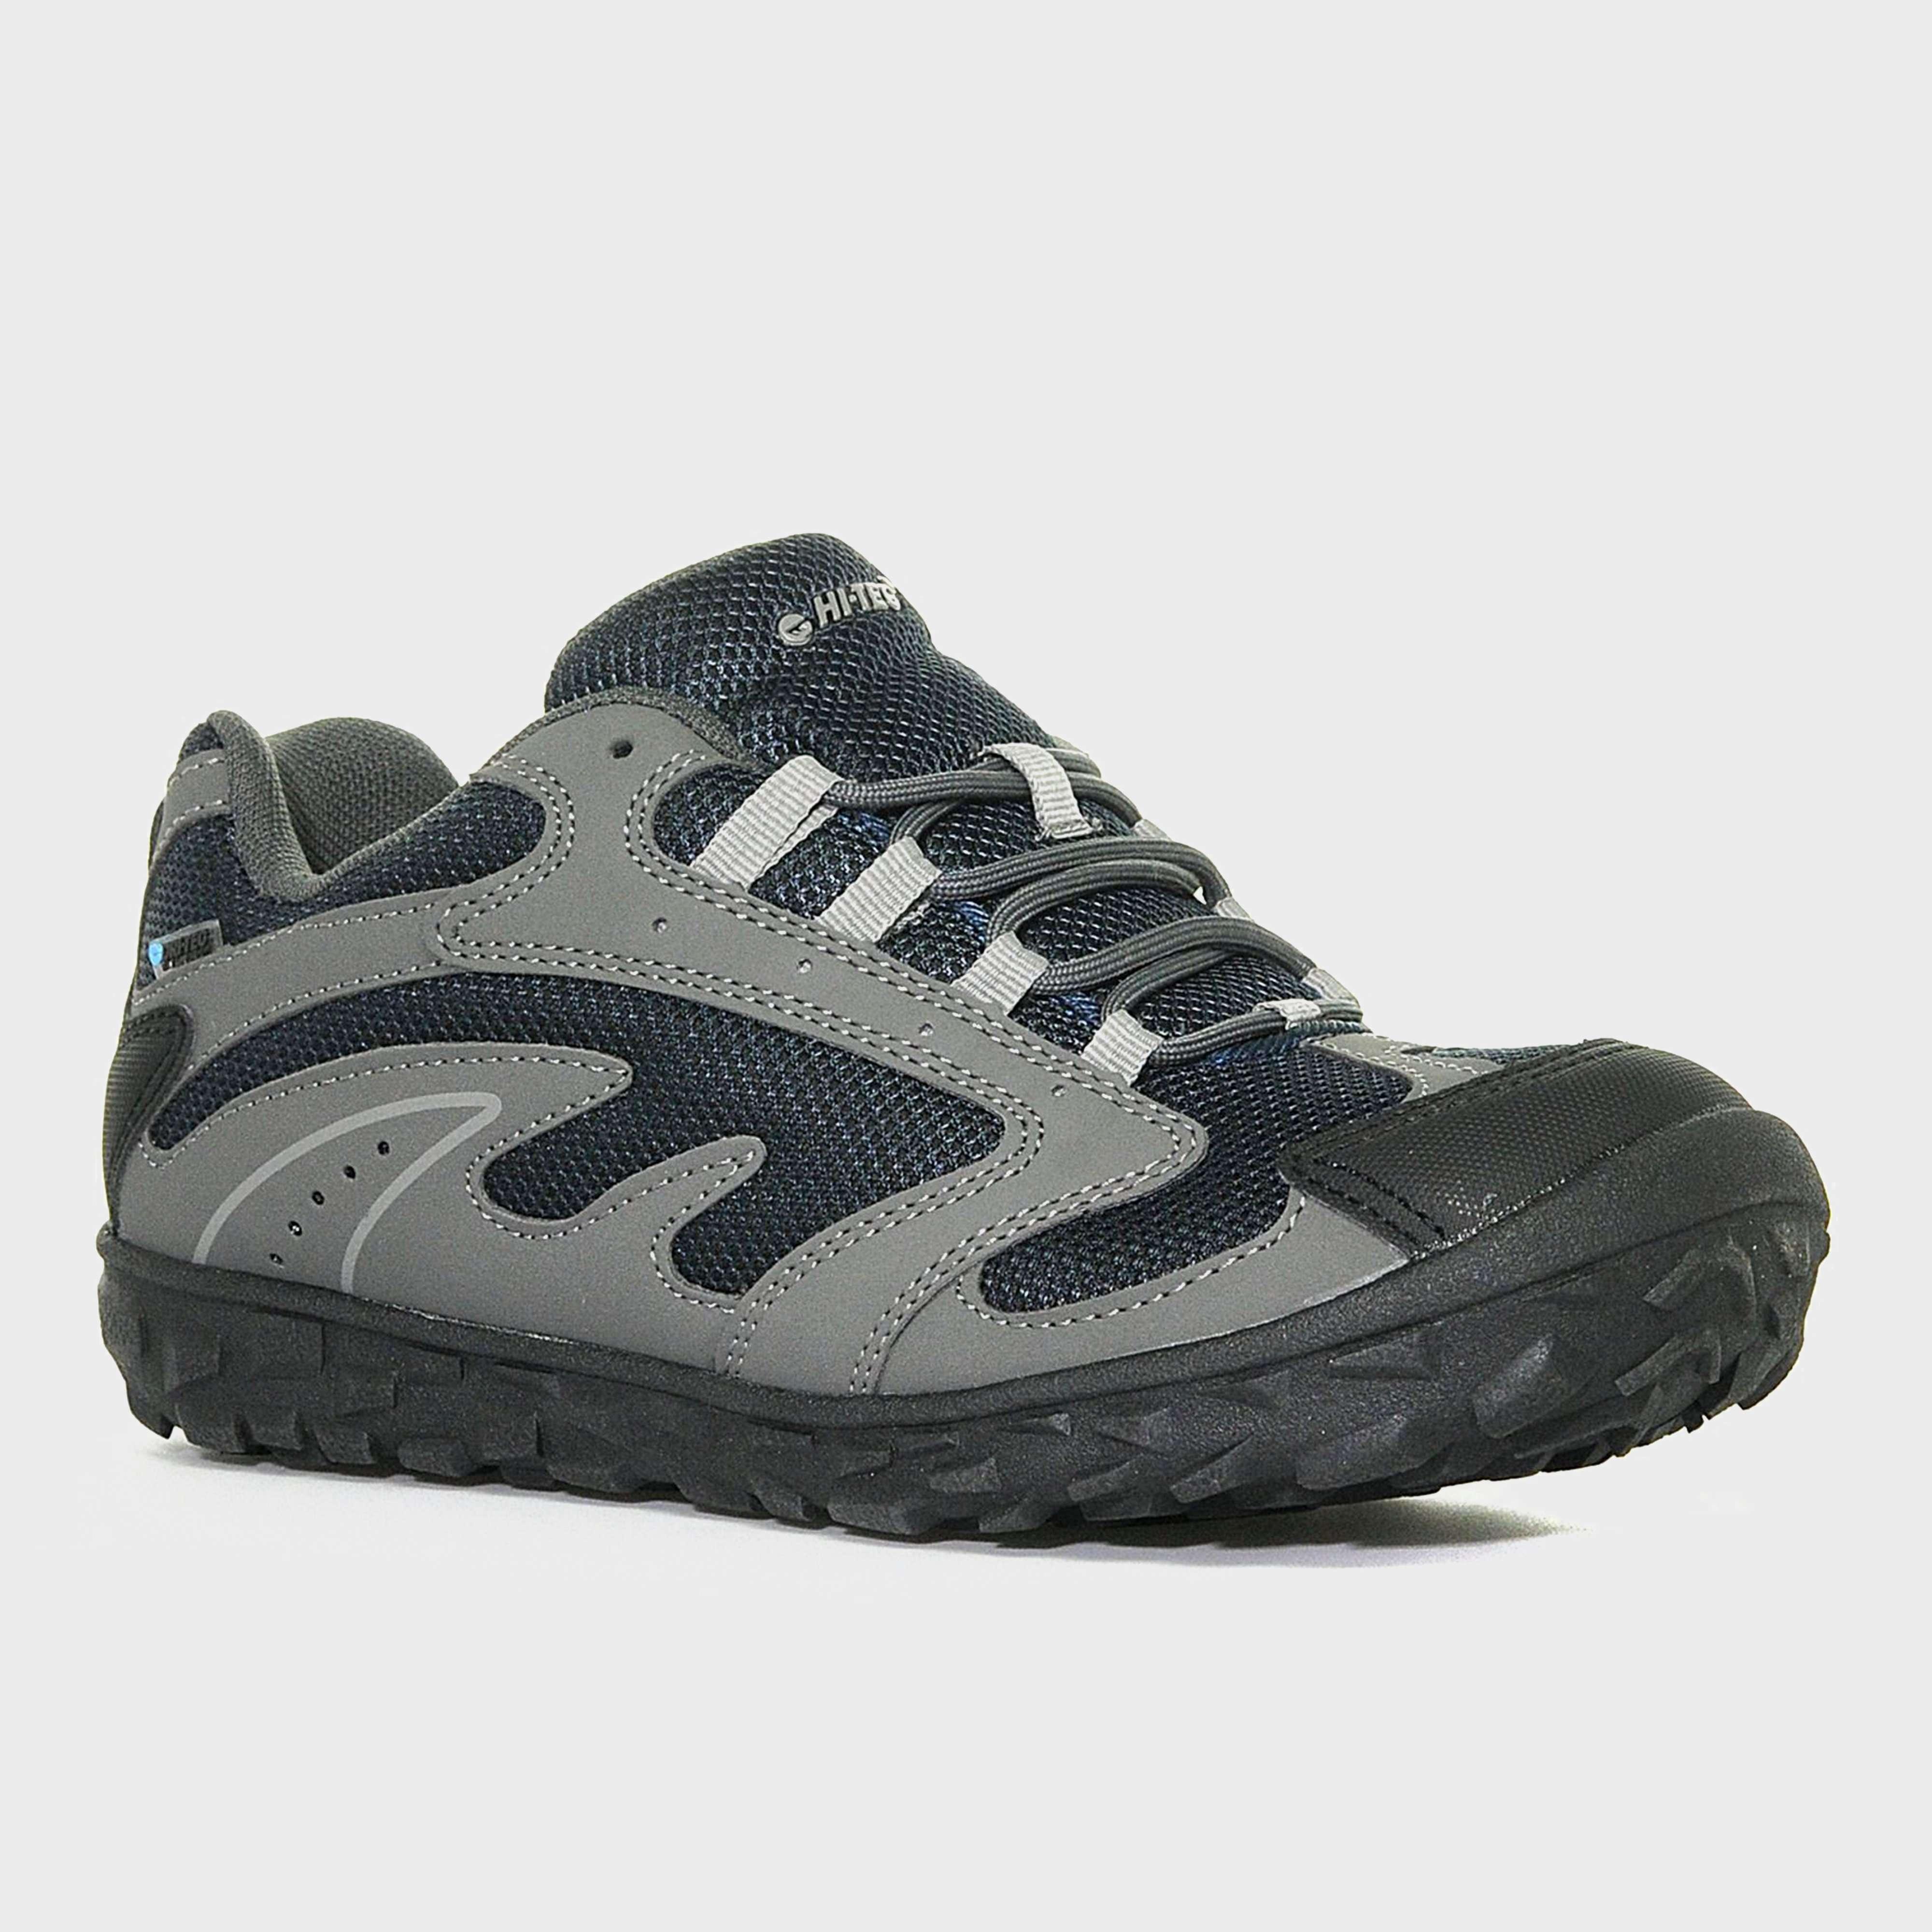 HI TEC Boys' Meridian Low-Cut Waterproof Multi-Sport Shoe